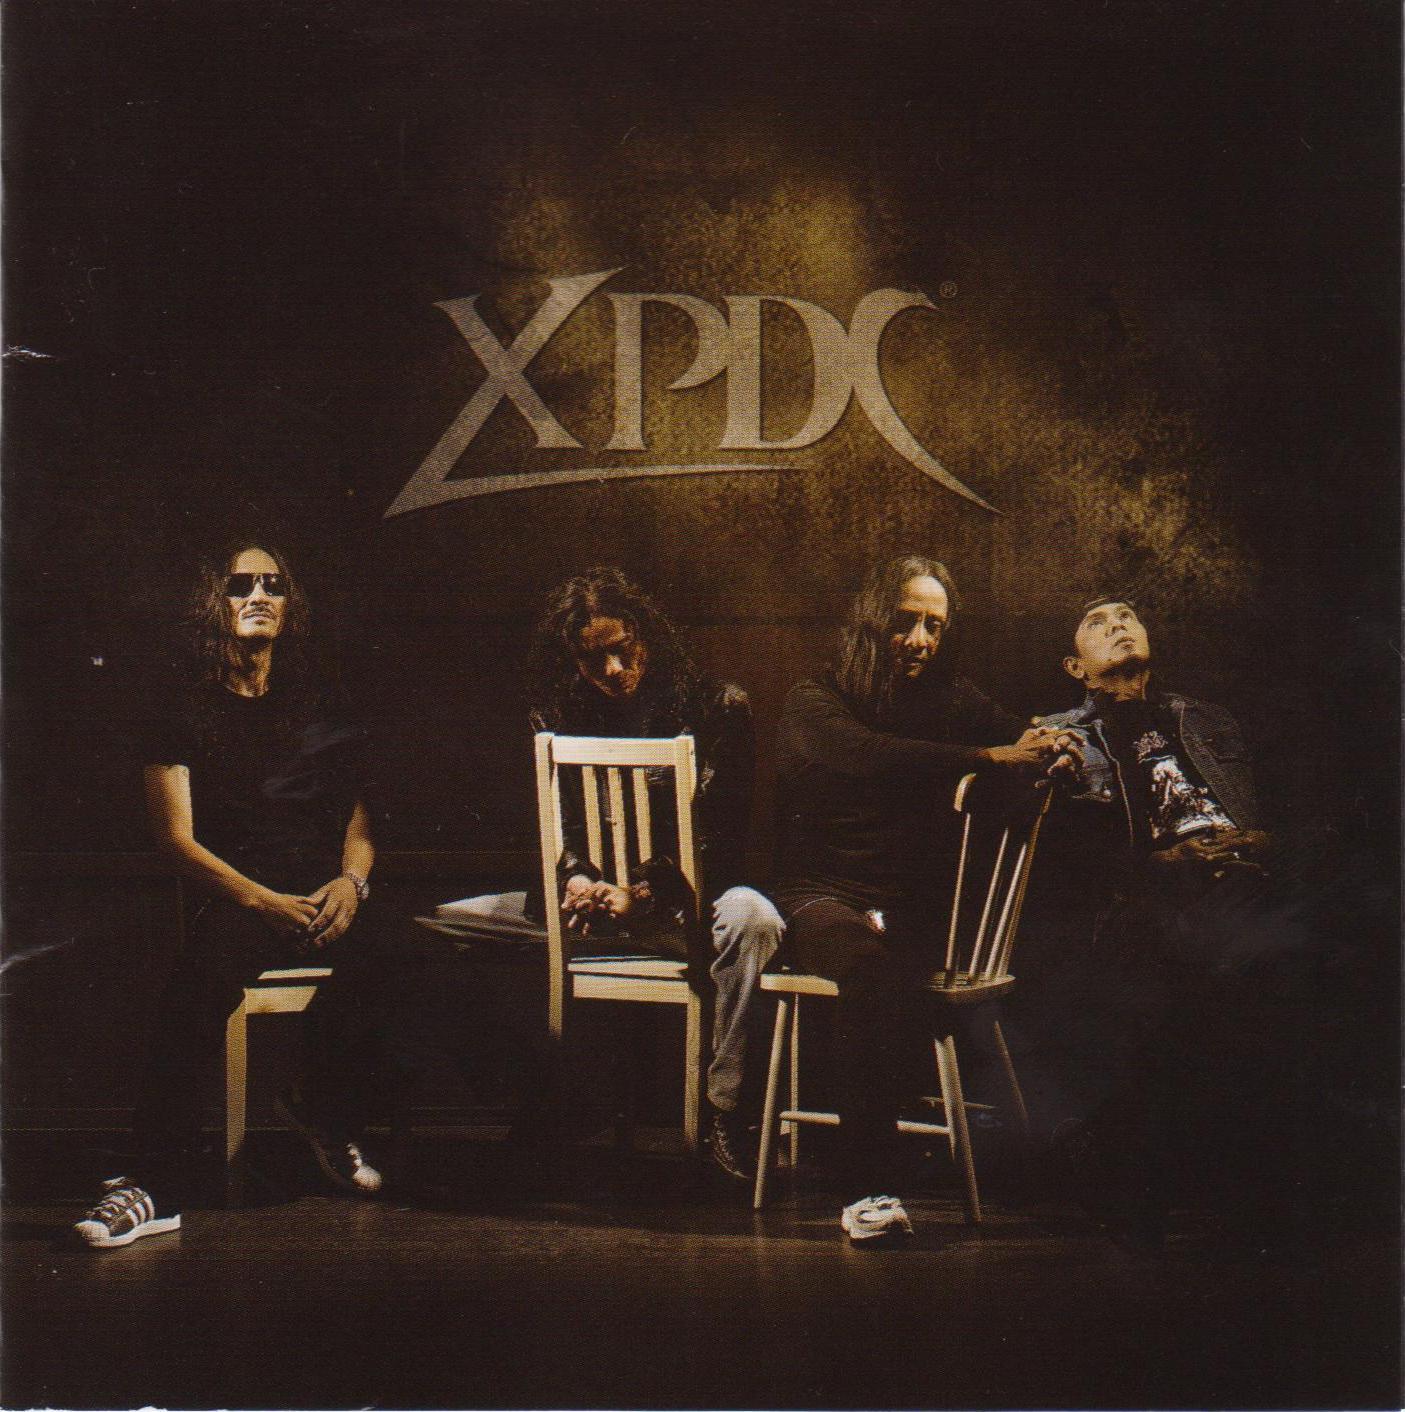 XPDC Khilaf